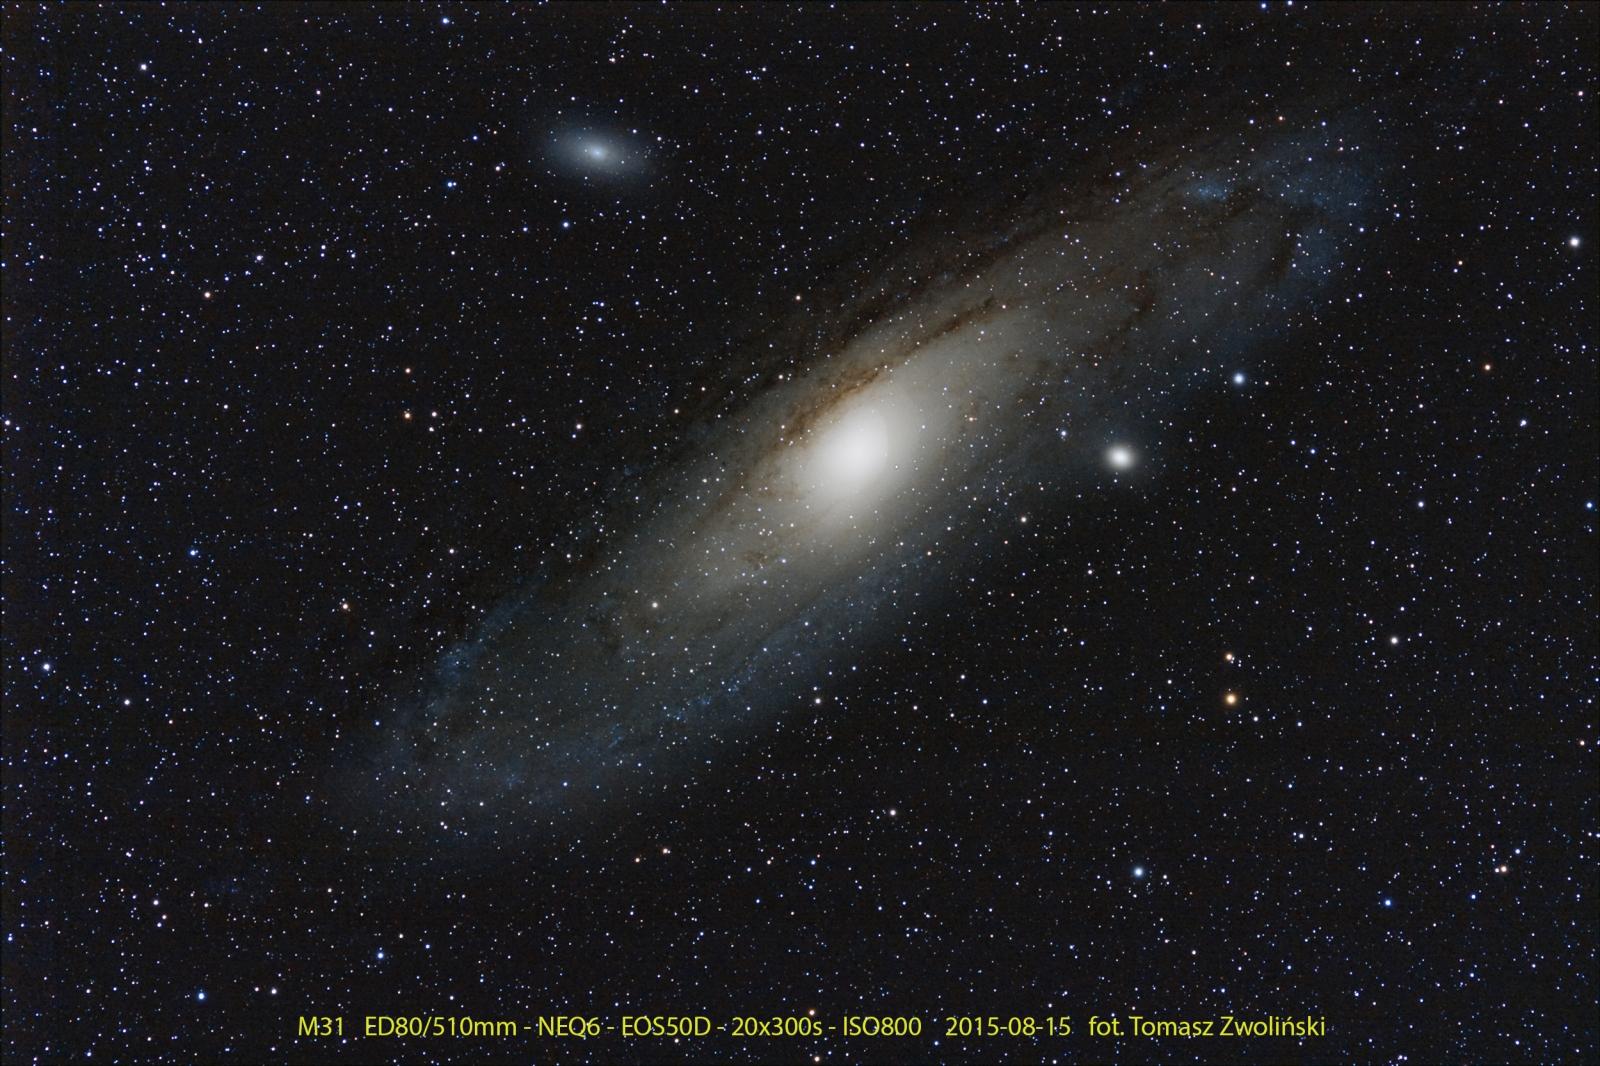 2015 08 15 M31